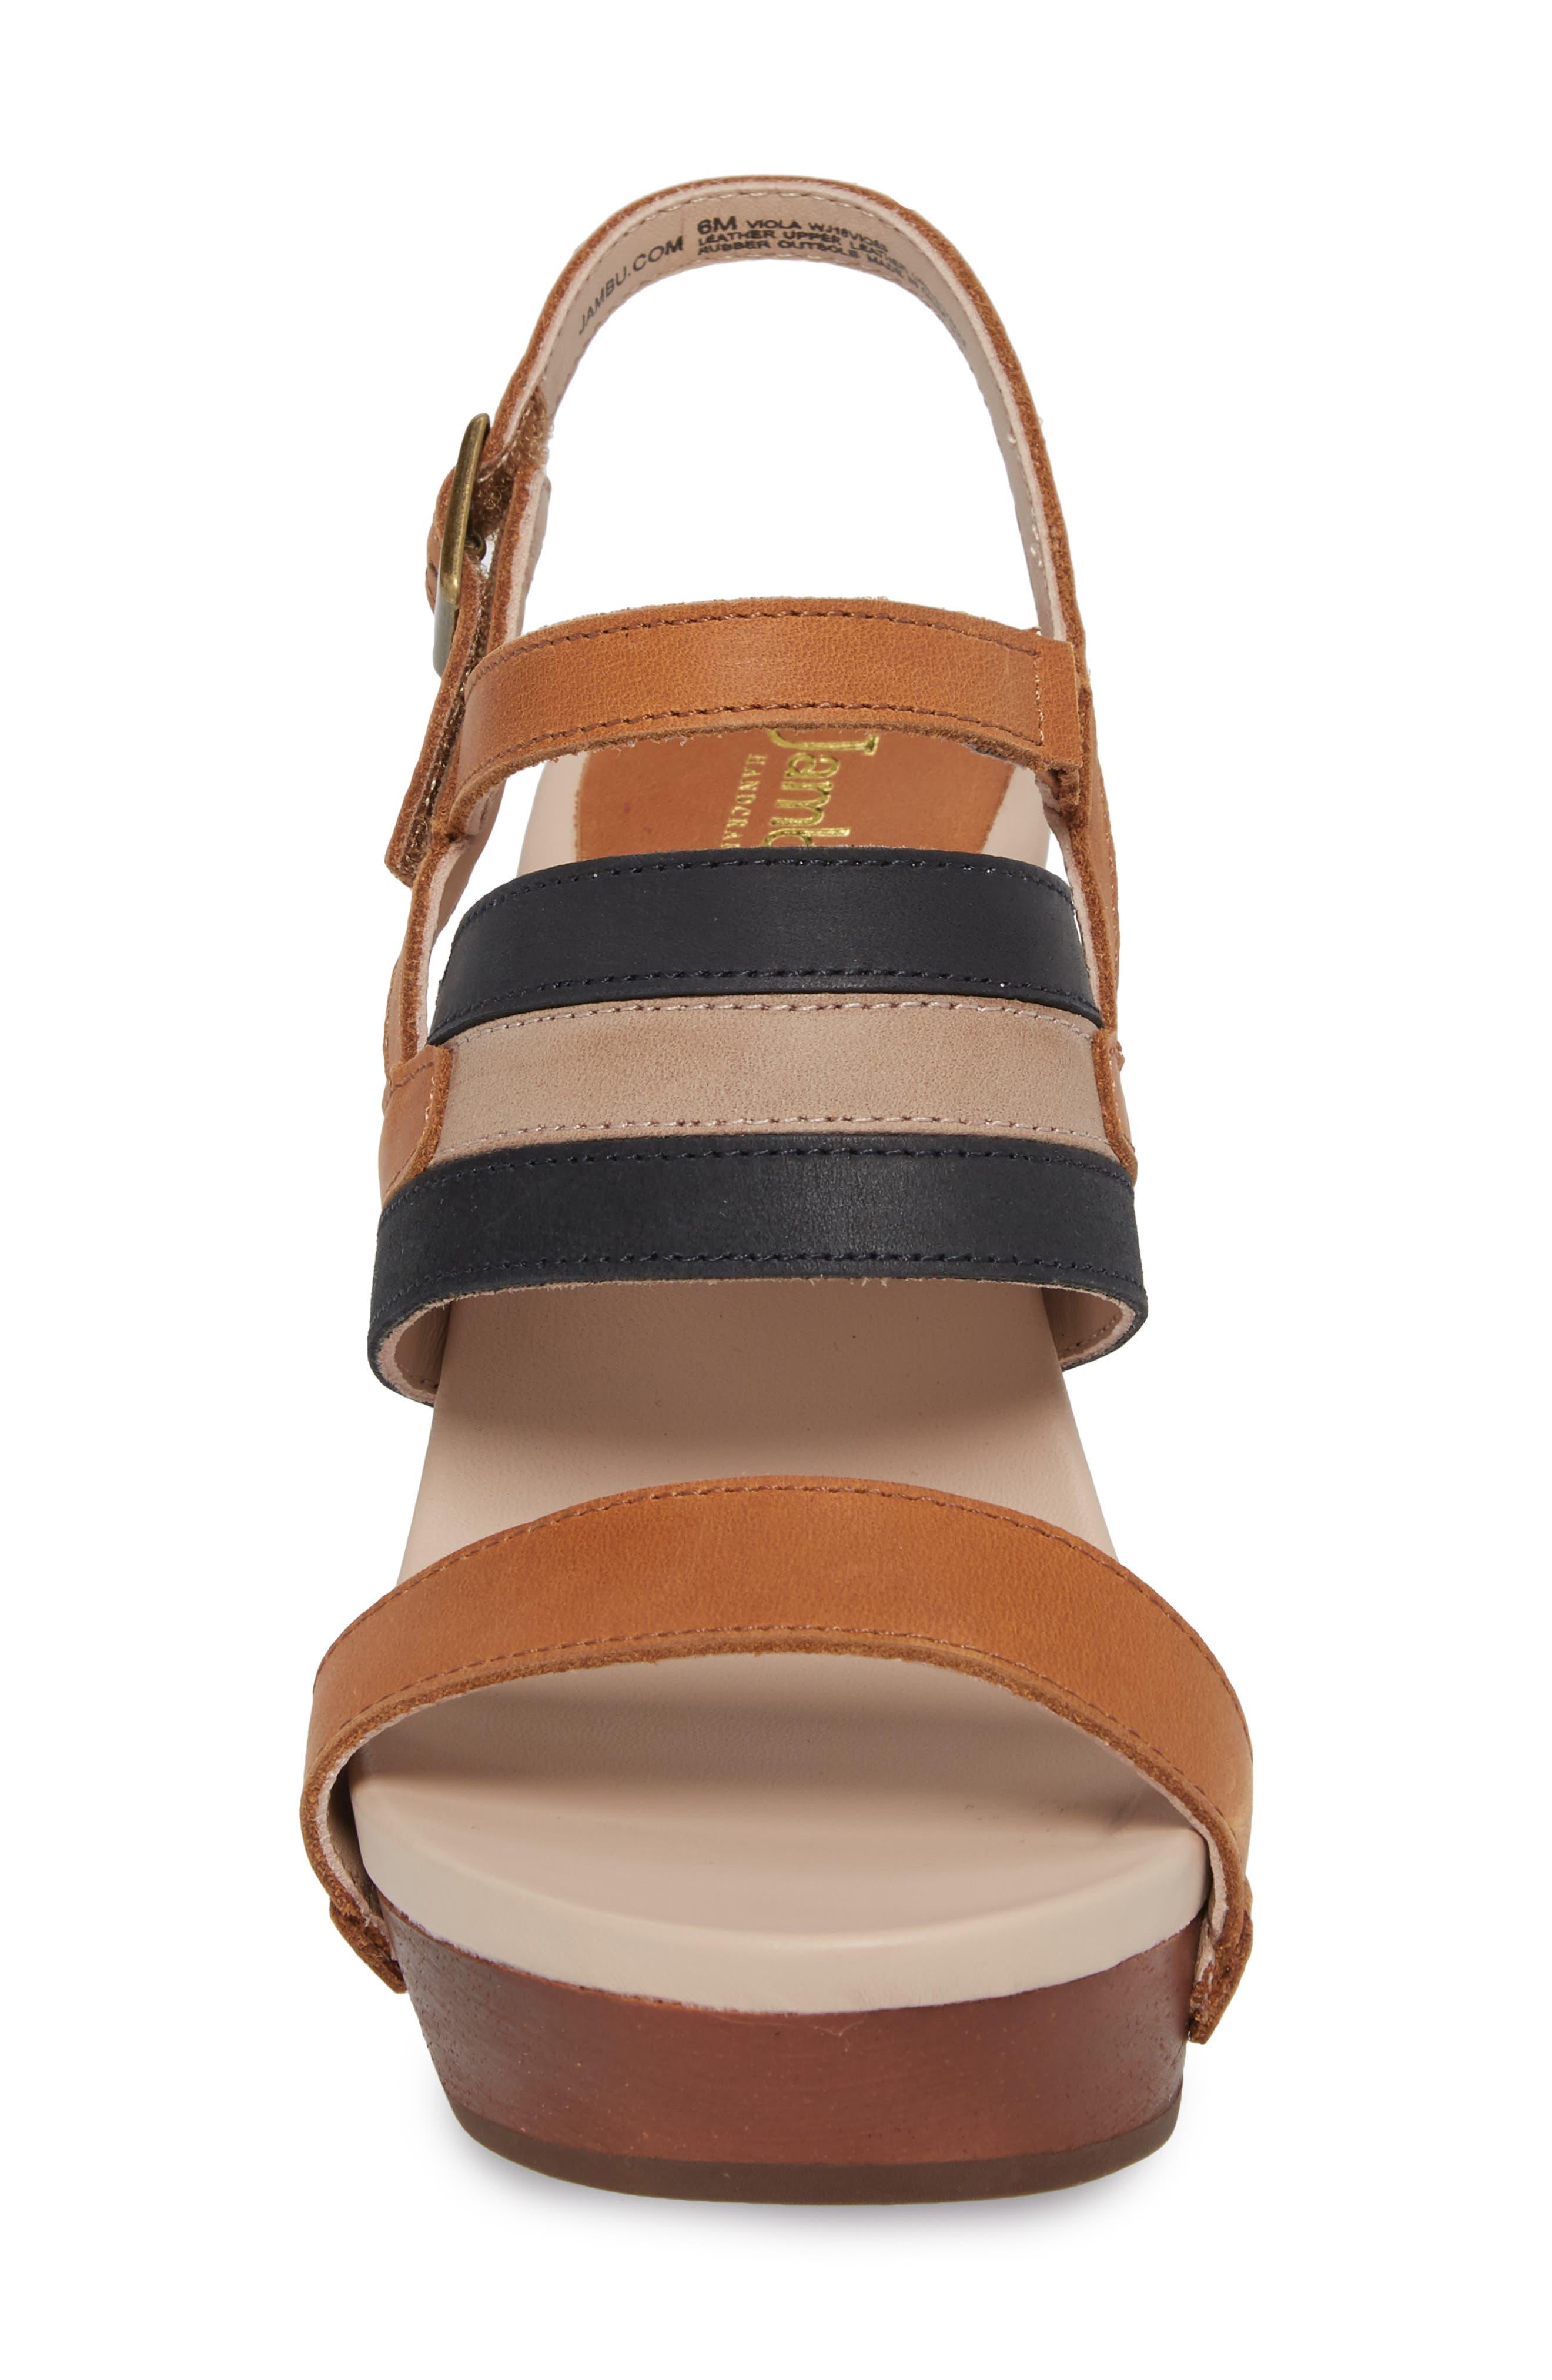 Viola Platform Sandal,                             Alternate thumbnail 4, color,                             200